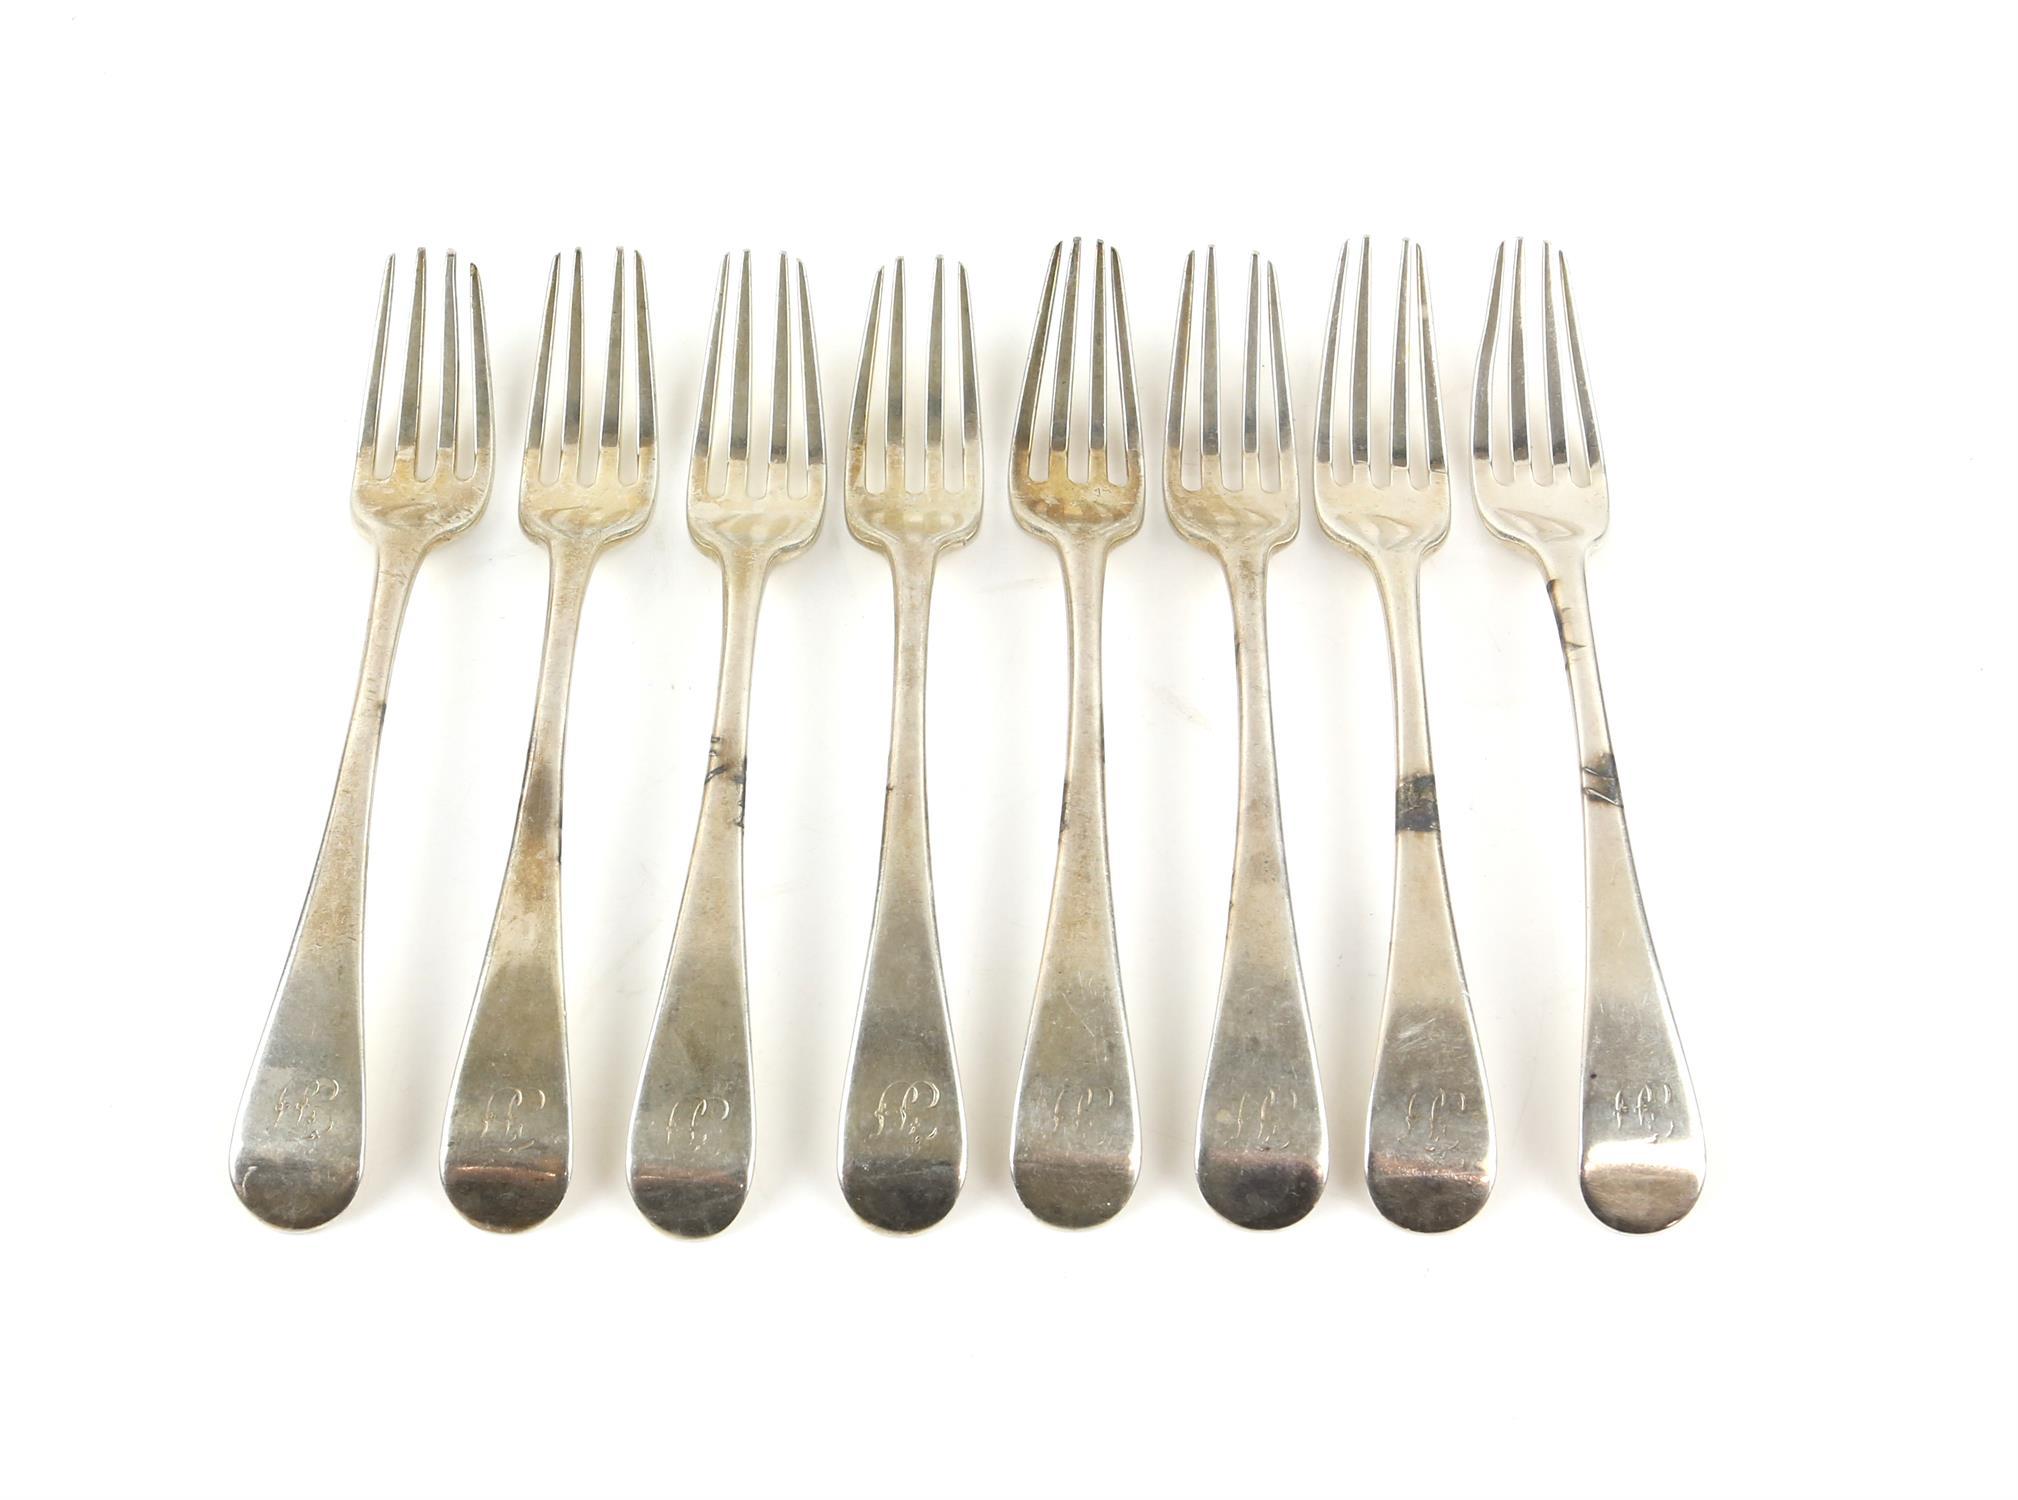 Set of 8 George III old English pattern dessert forks London 1795 Makers Mark HS, 10 ozs